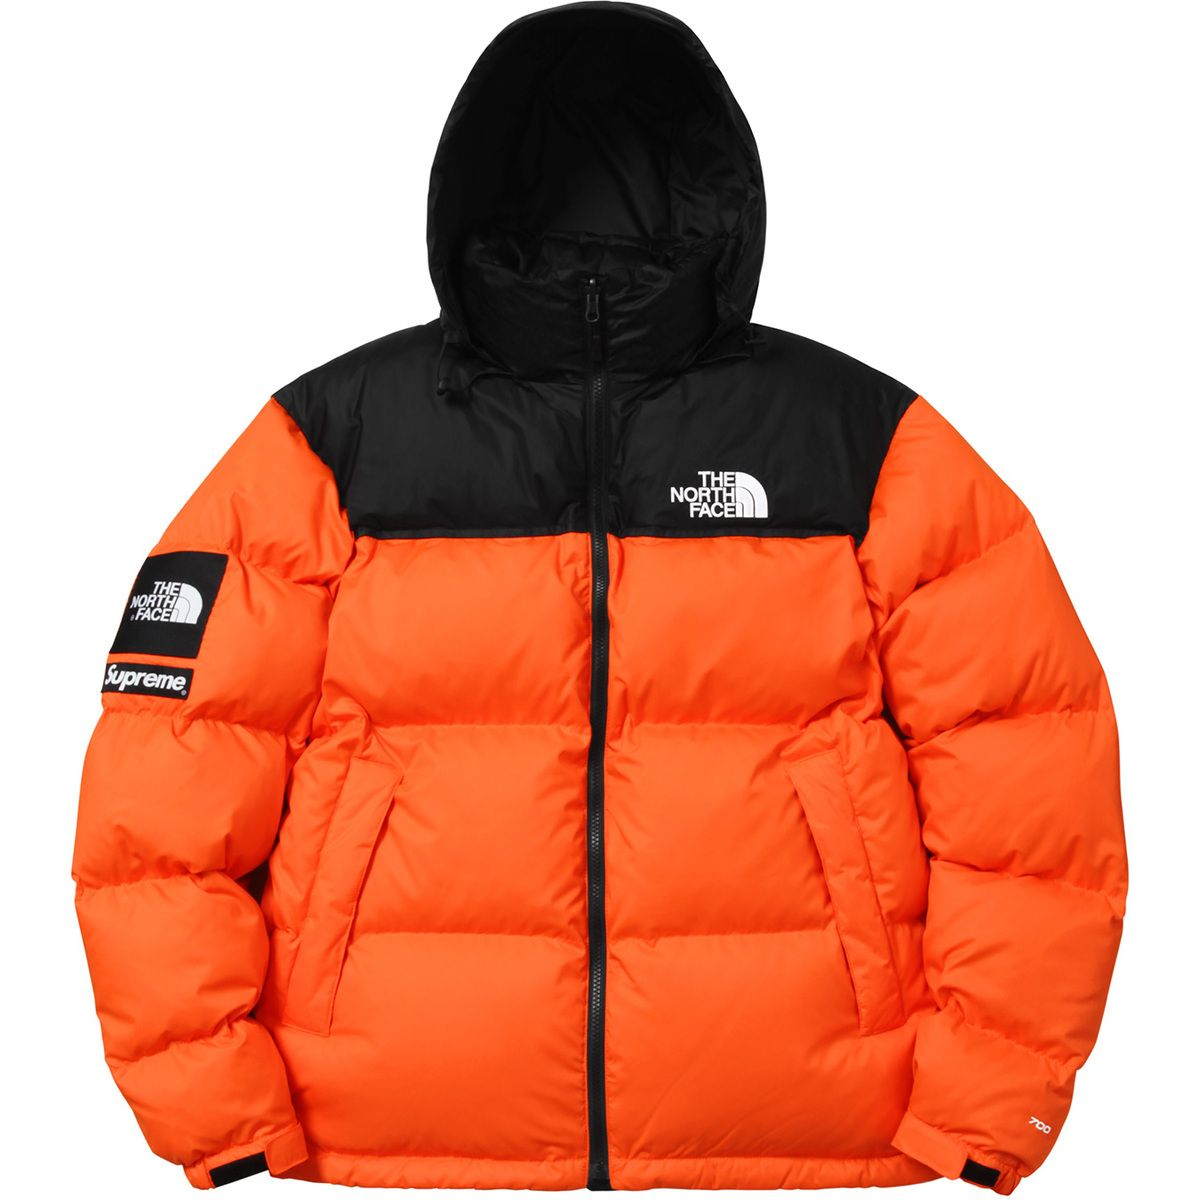 Supreme North Face Jacket Mens North Face Puffer Jacket North Face Jacket